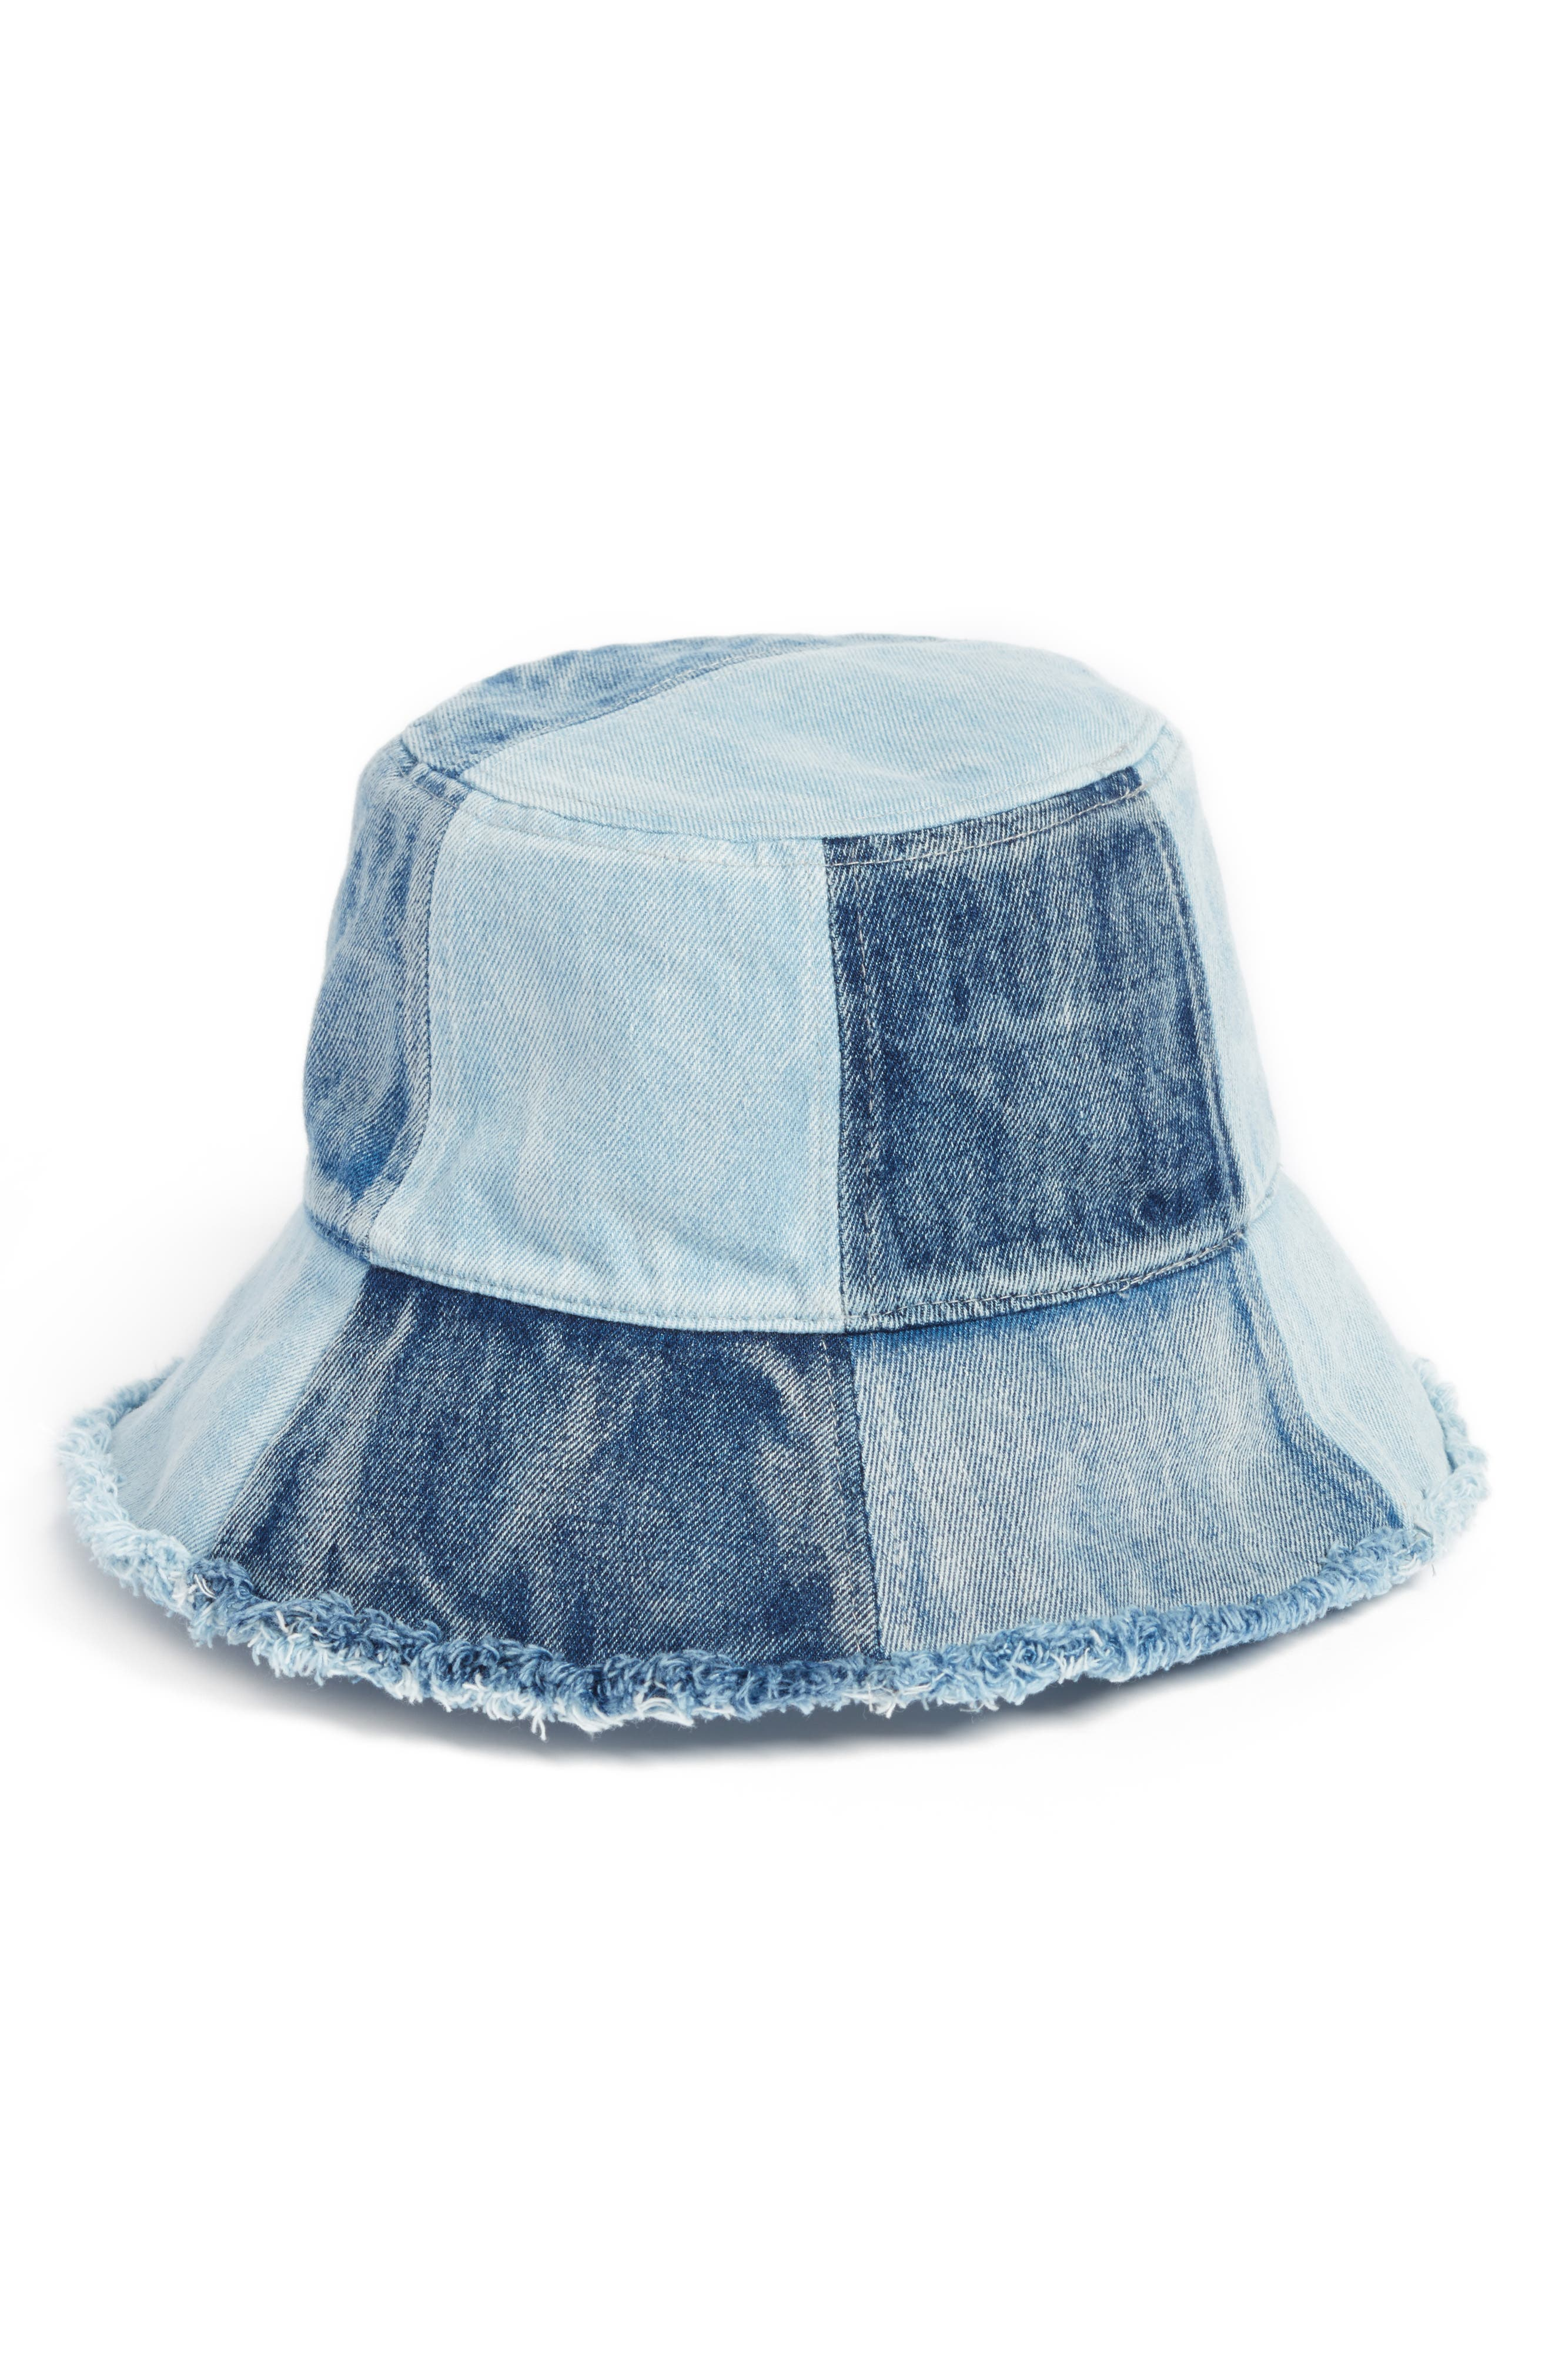 Patched Denim Bucket Hat,                             Main thumbnail 1, color,                             410